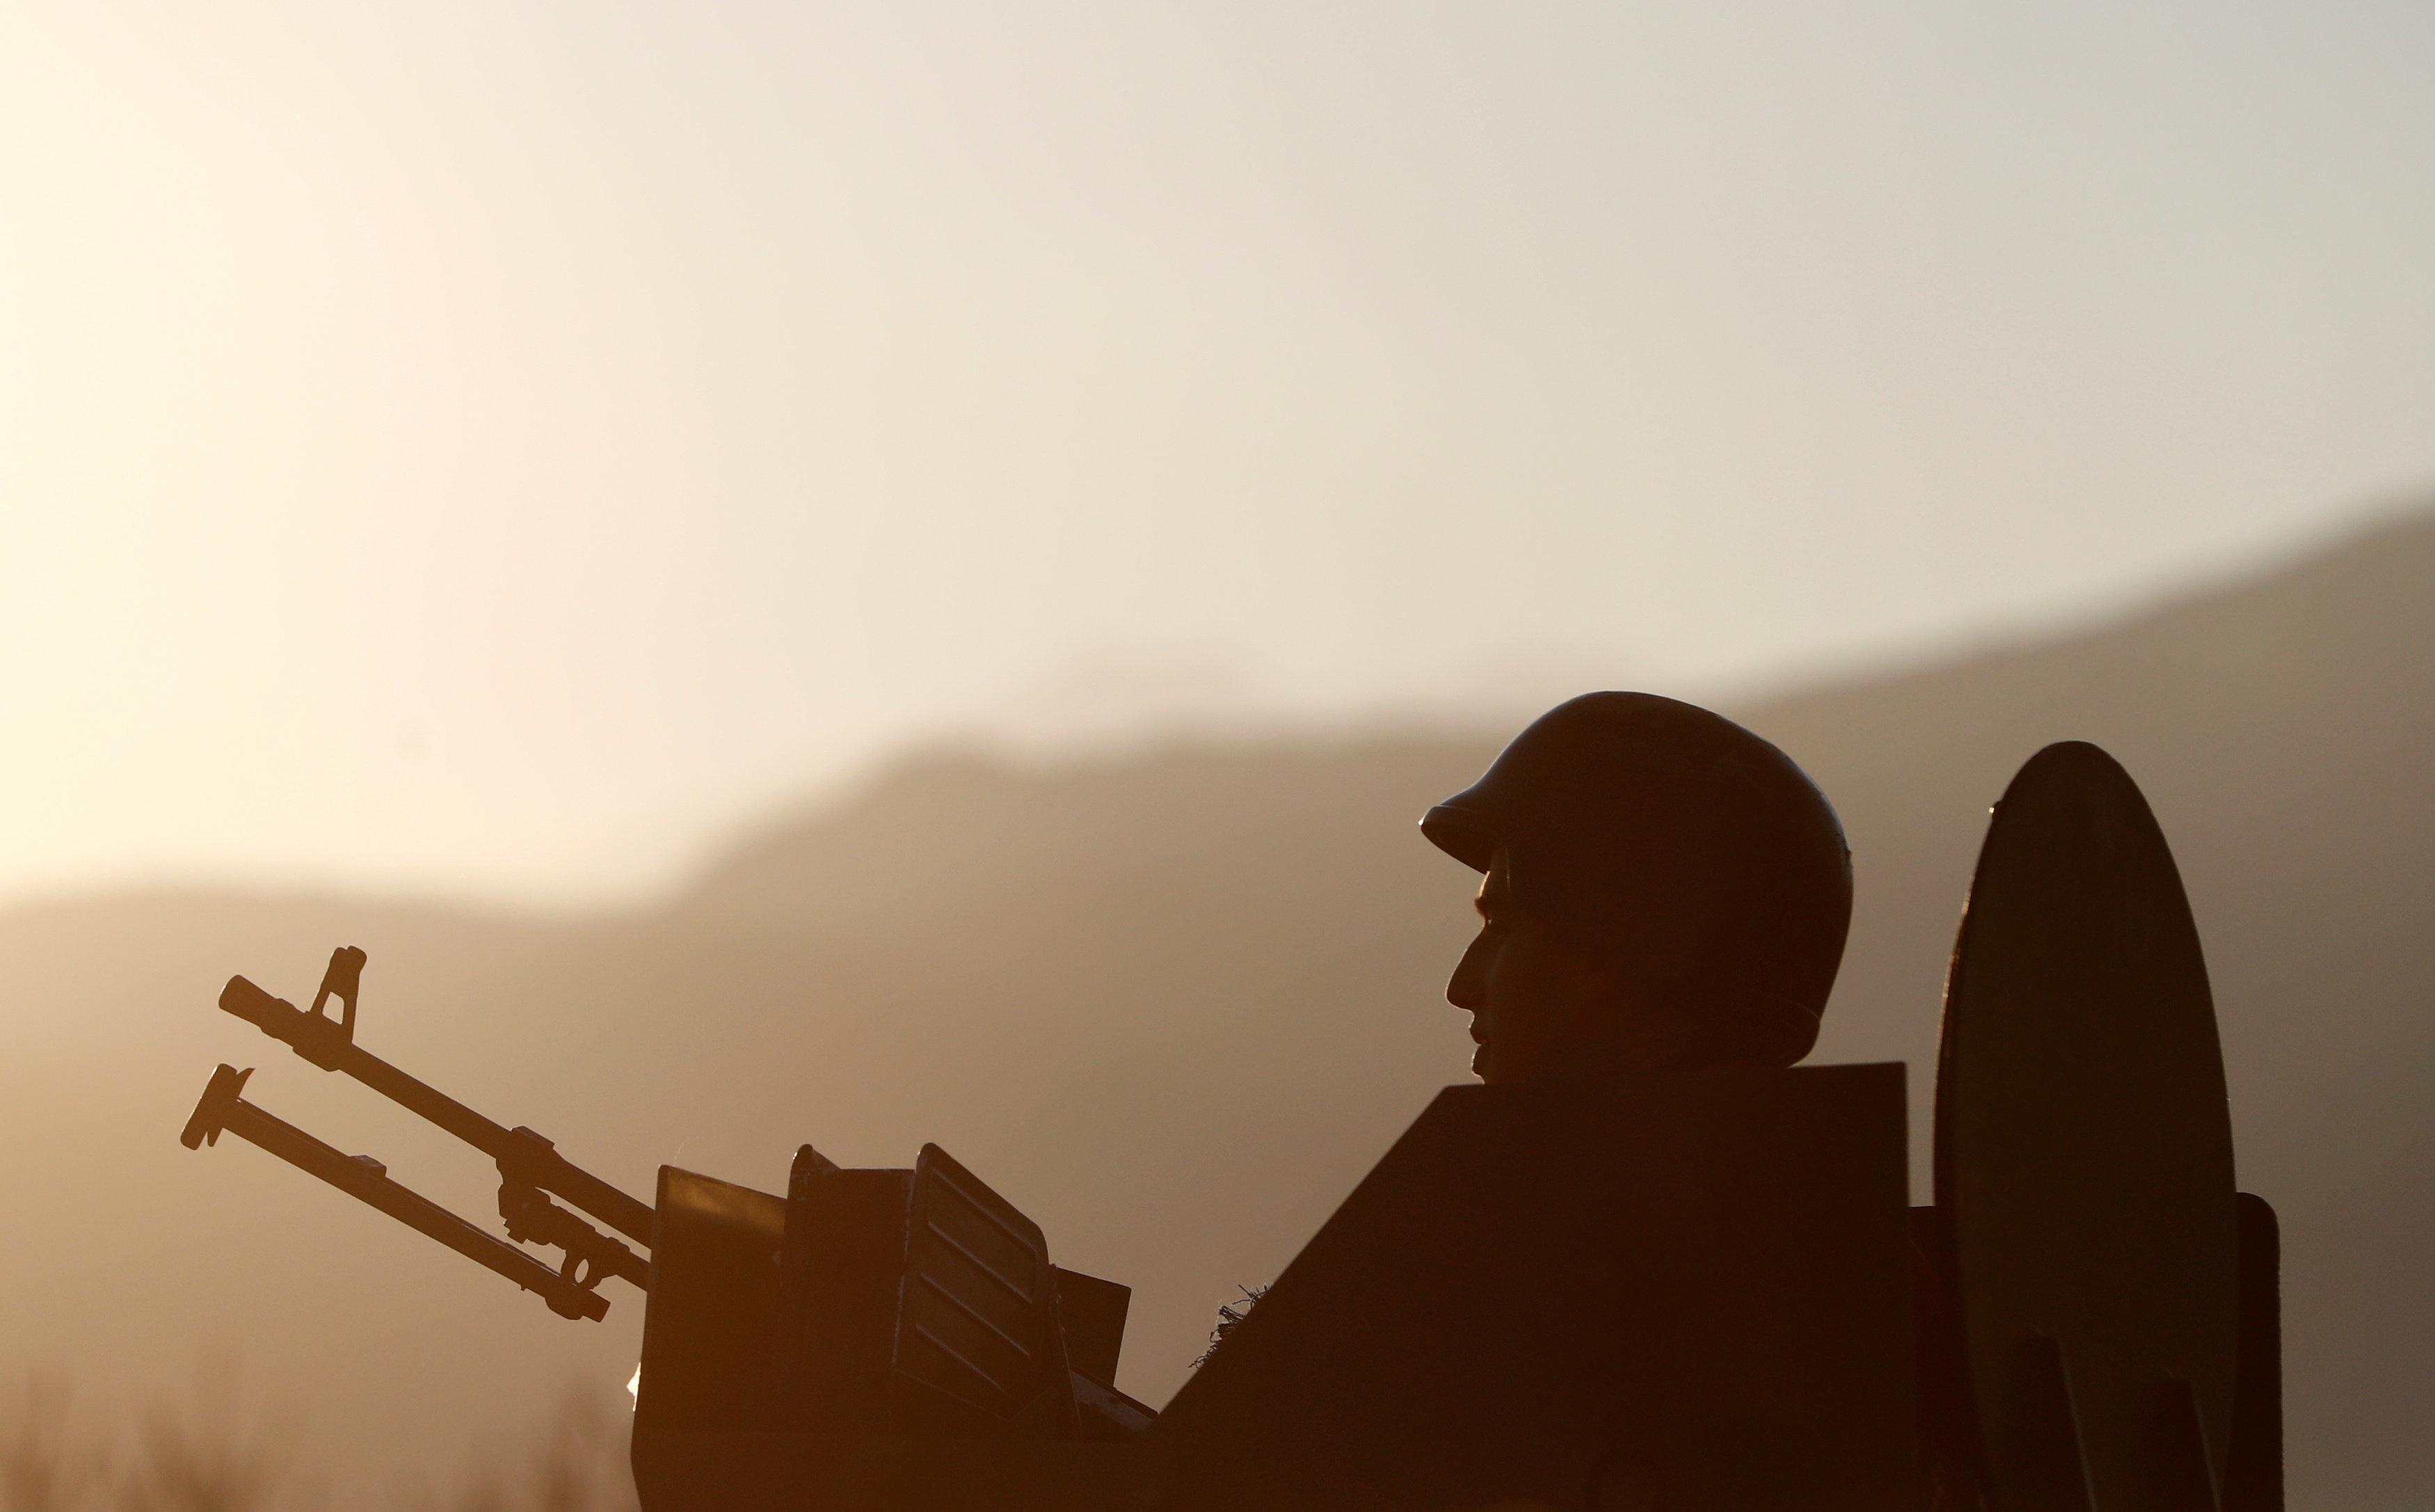 Der Spiegel: Άσυλο σε τέσσερις Τούρκους στρατιωτικούς χορήγησαν οι γερμανικές